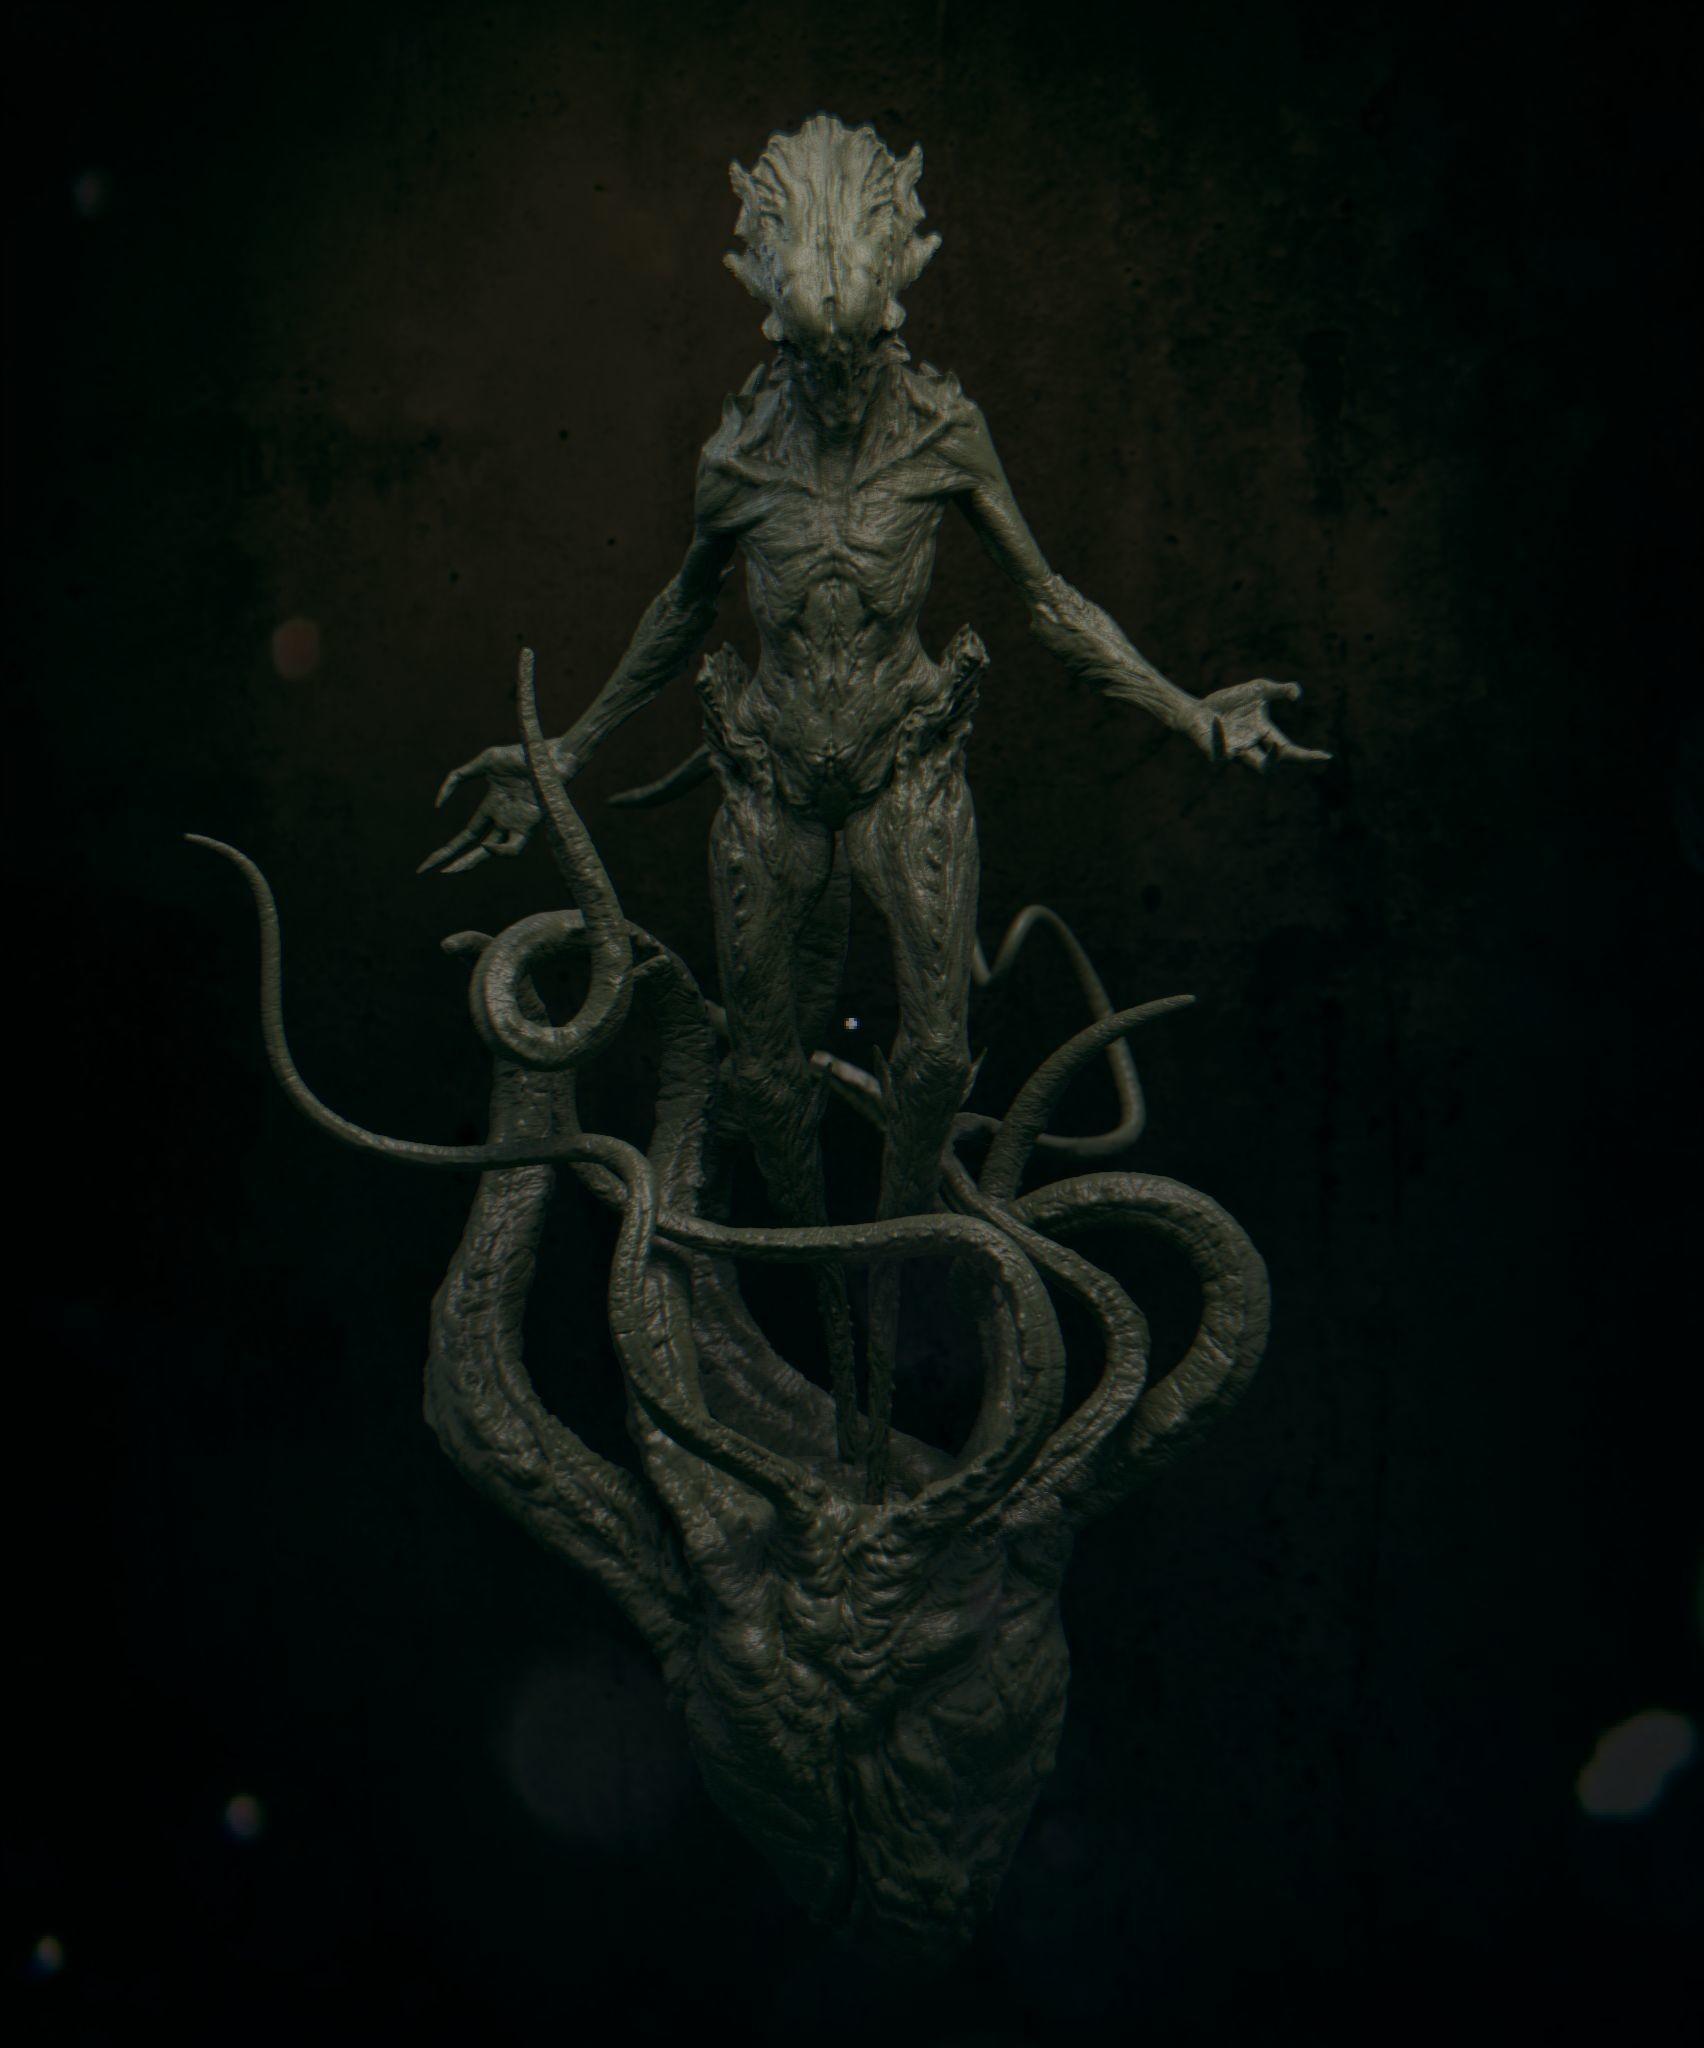 Daniel bystedt lovecraft monster